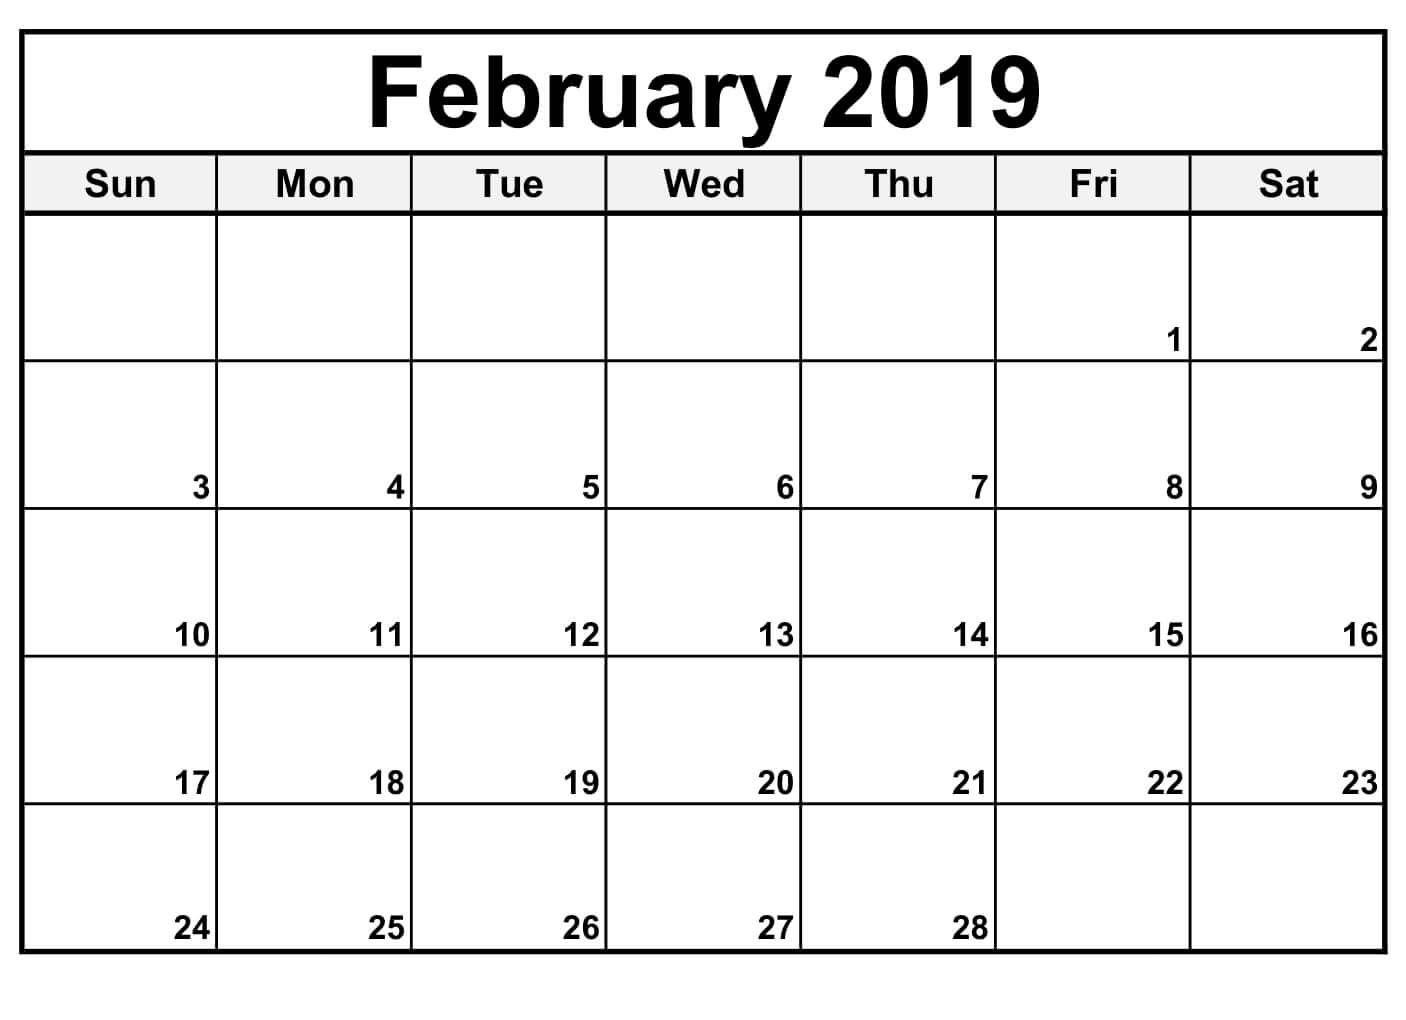 February 2019 Calendar Editable | Free Printable February